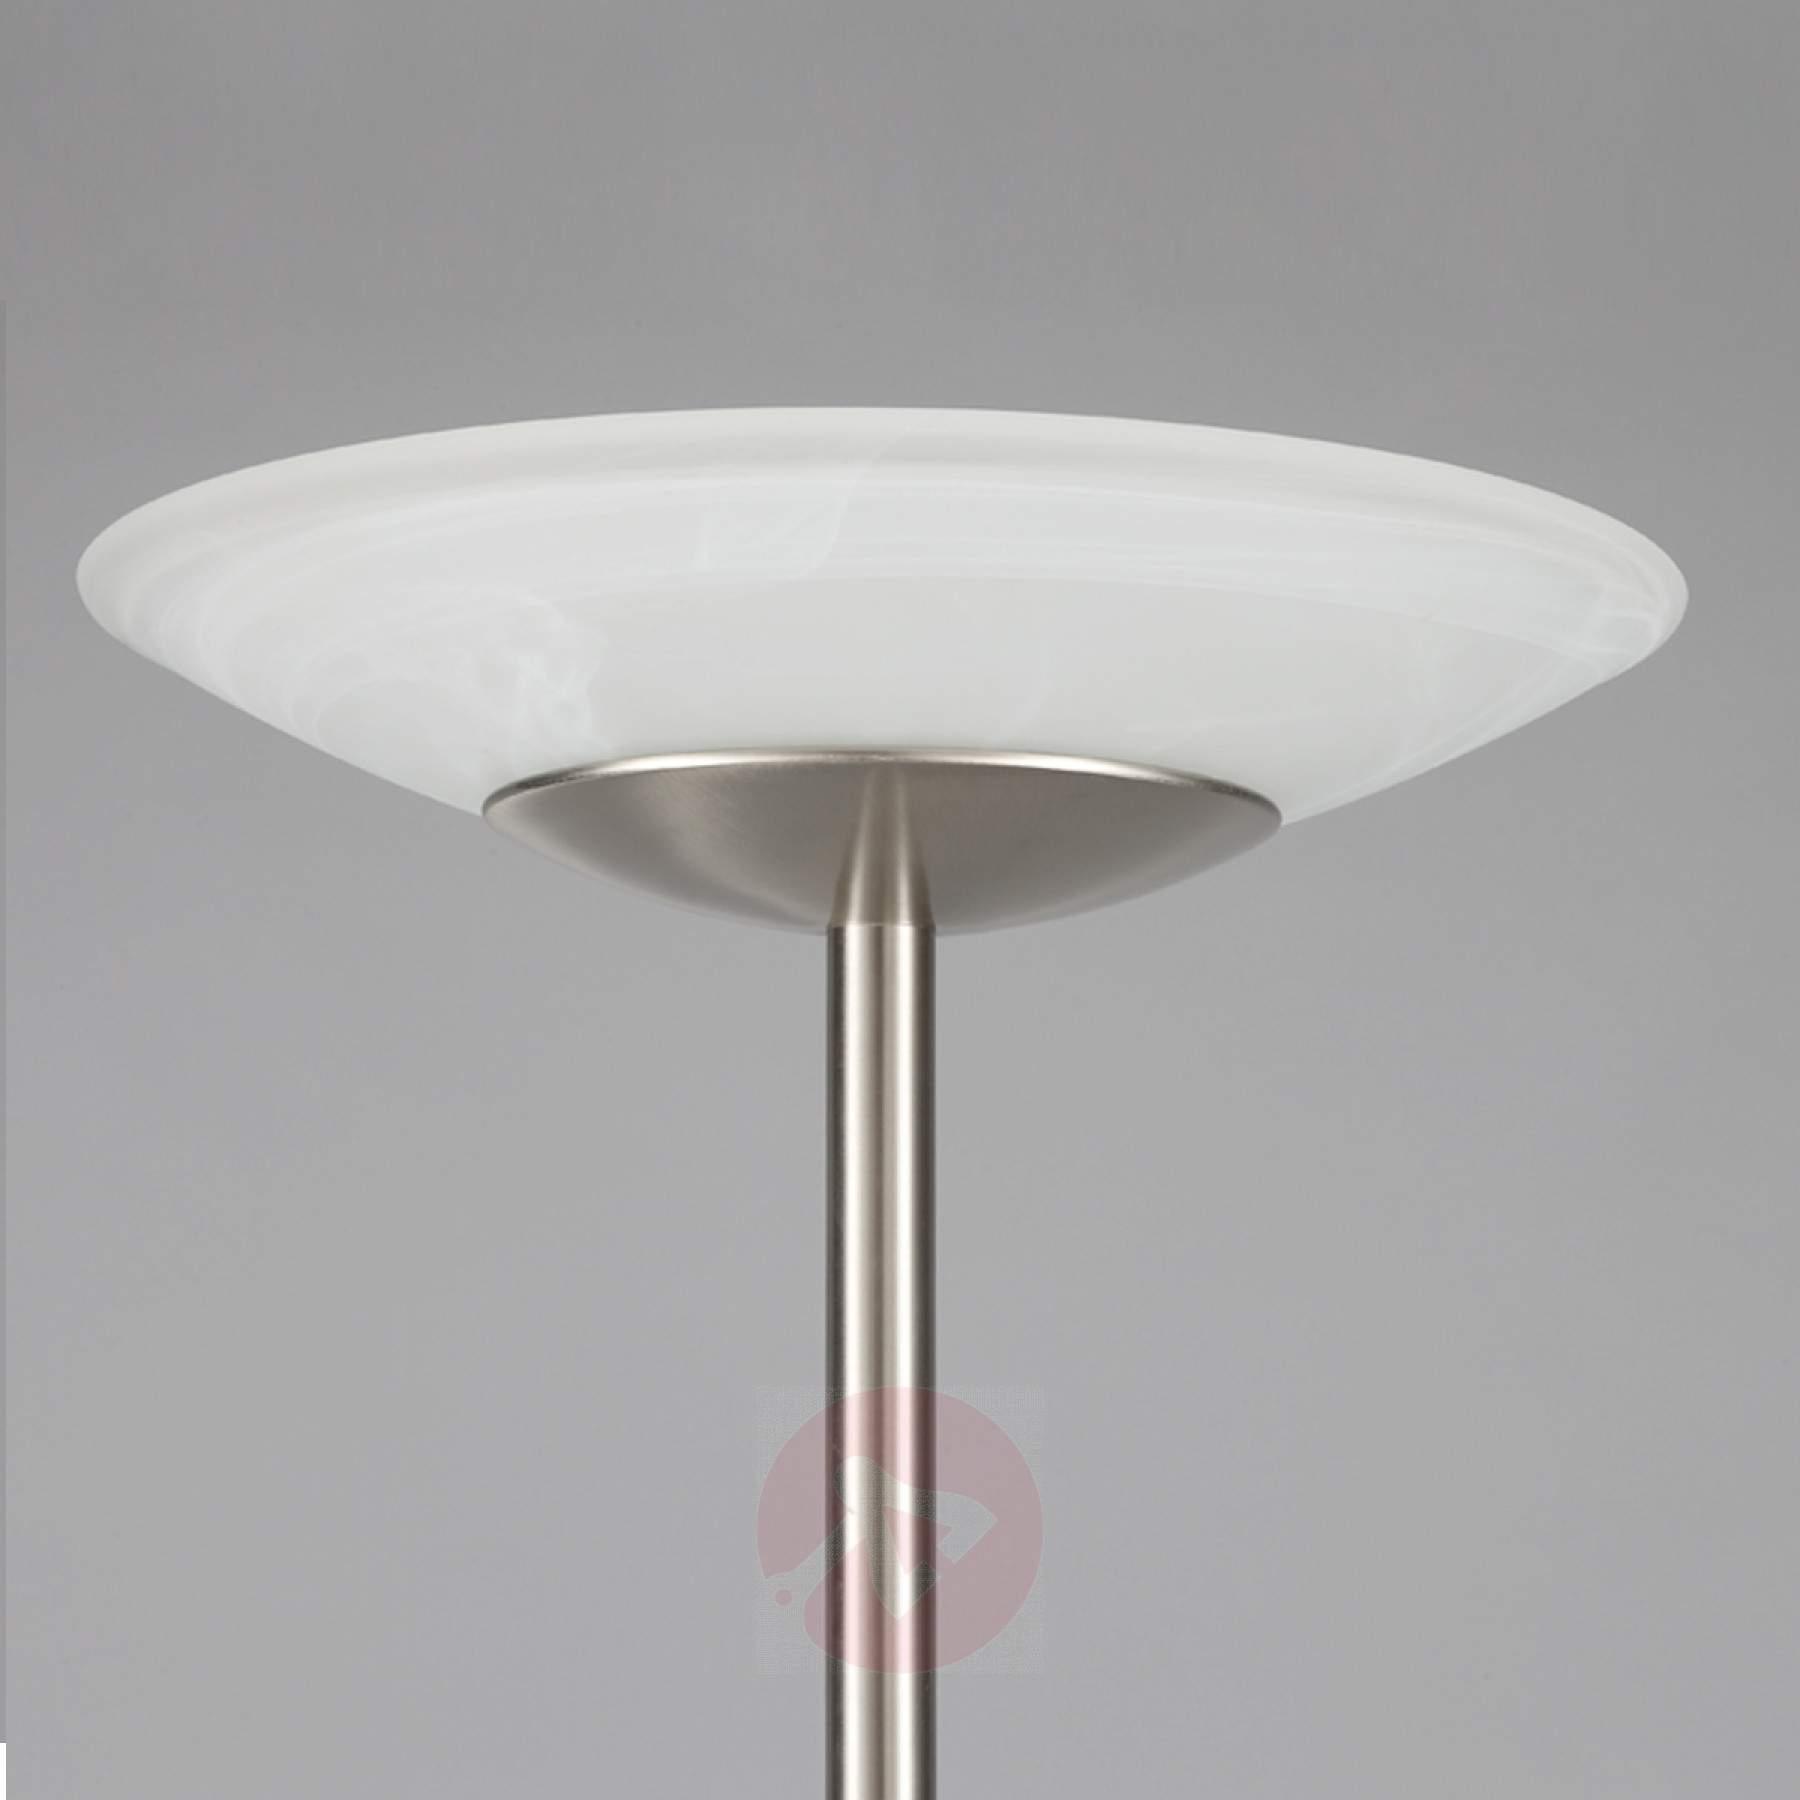 Full Size of Stehleuchte Led Dimmbar Design Stehlampe Aldi Deckenfluter Messing Mit Leseleuchte 3000 Lumen Edelstahl Amazon Fernbedienung Leselampe Test Stehlampen Sofa Wohnzimmer Stehlampe Led Dimmbar